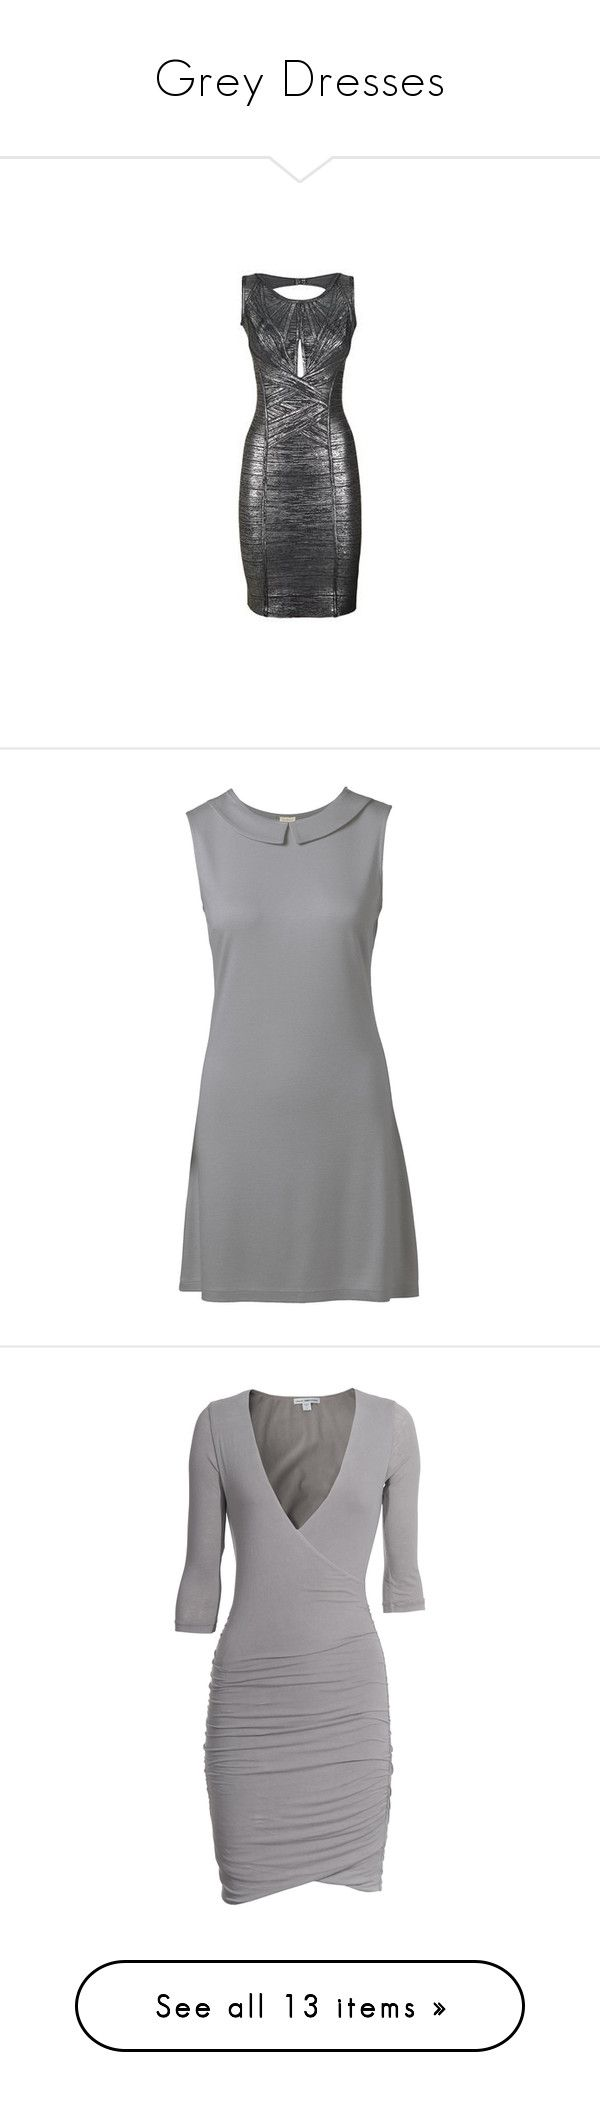 """Grey Dresses"" by ashleythesm ❤ liked on Polyvore featuring dresses, metallic dress, hervé léger, herve leger dress, metallic cocktail dress, vestidos, short dresses, robes, vestiti and short sleeve cocktail dresses"